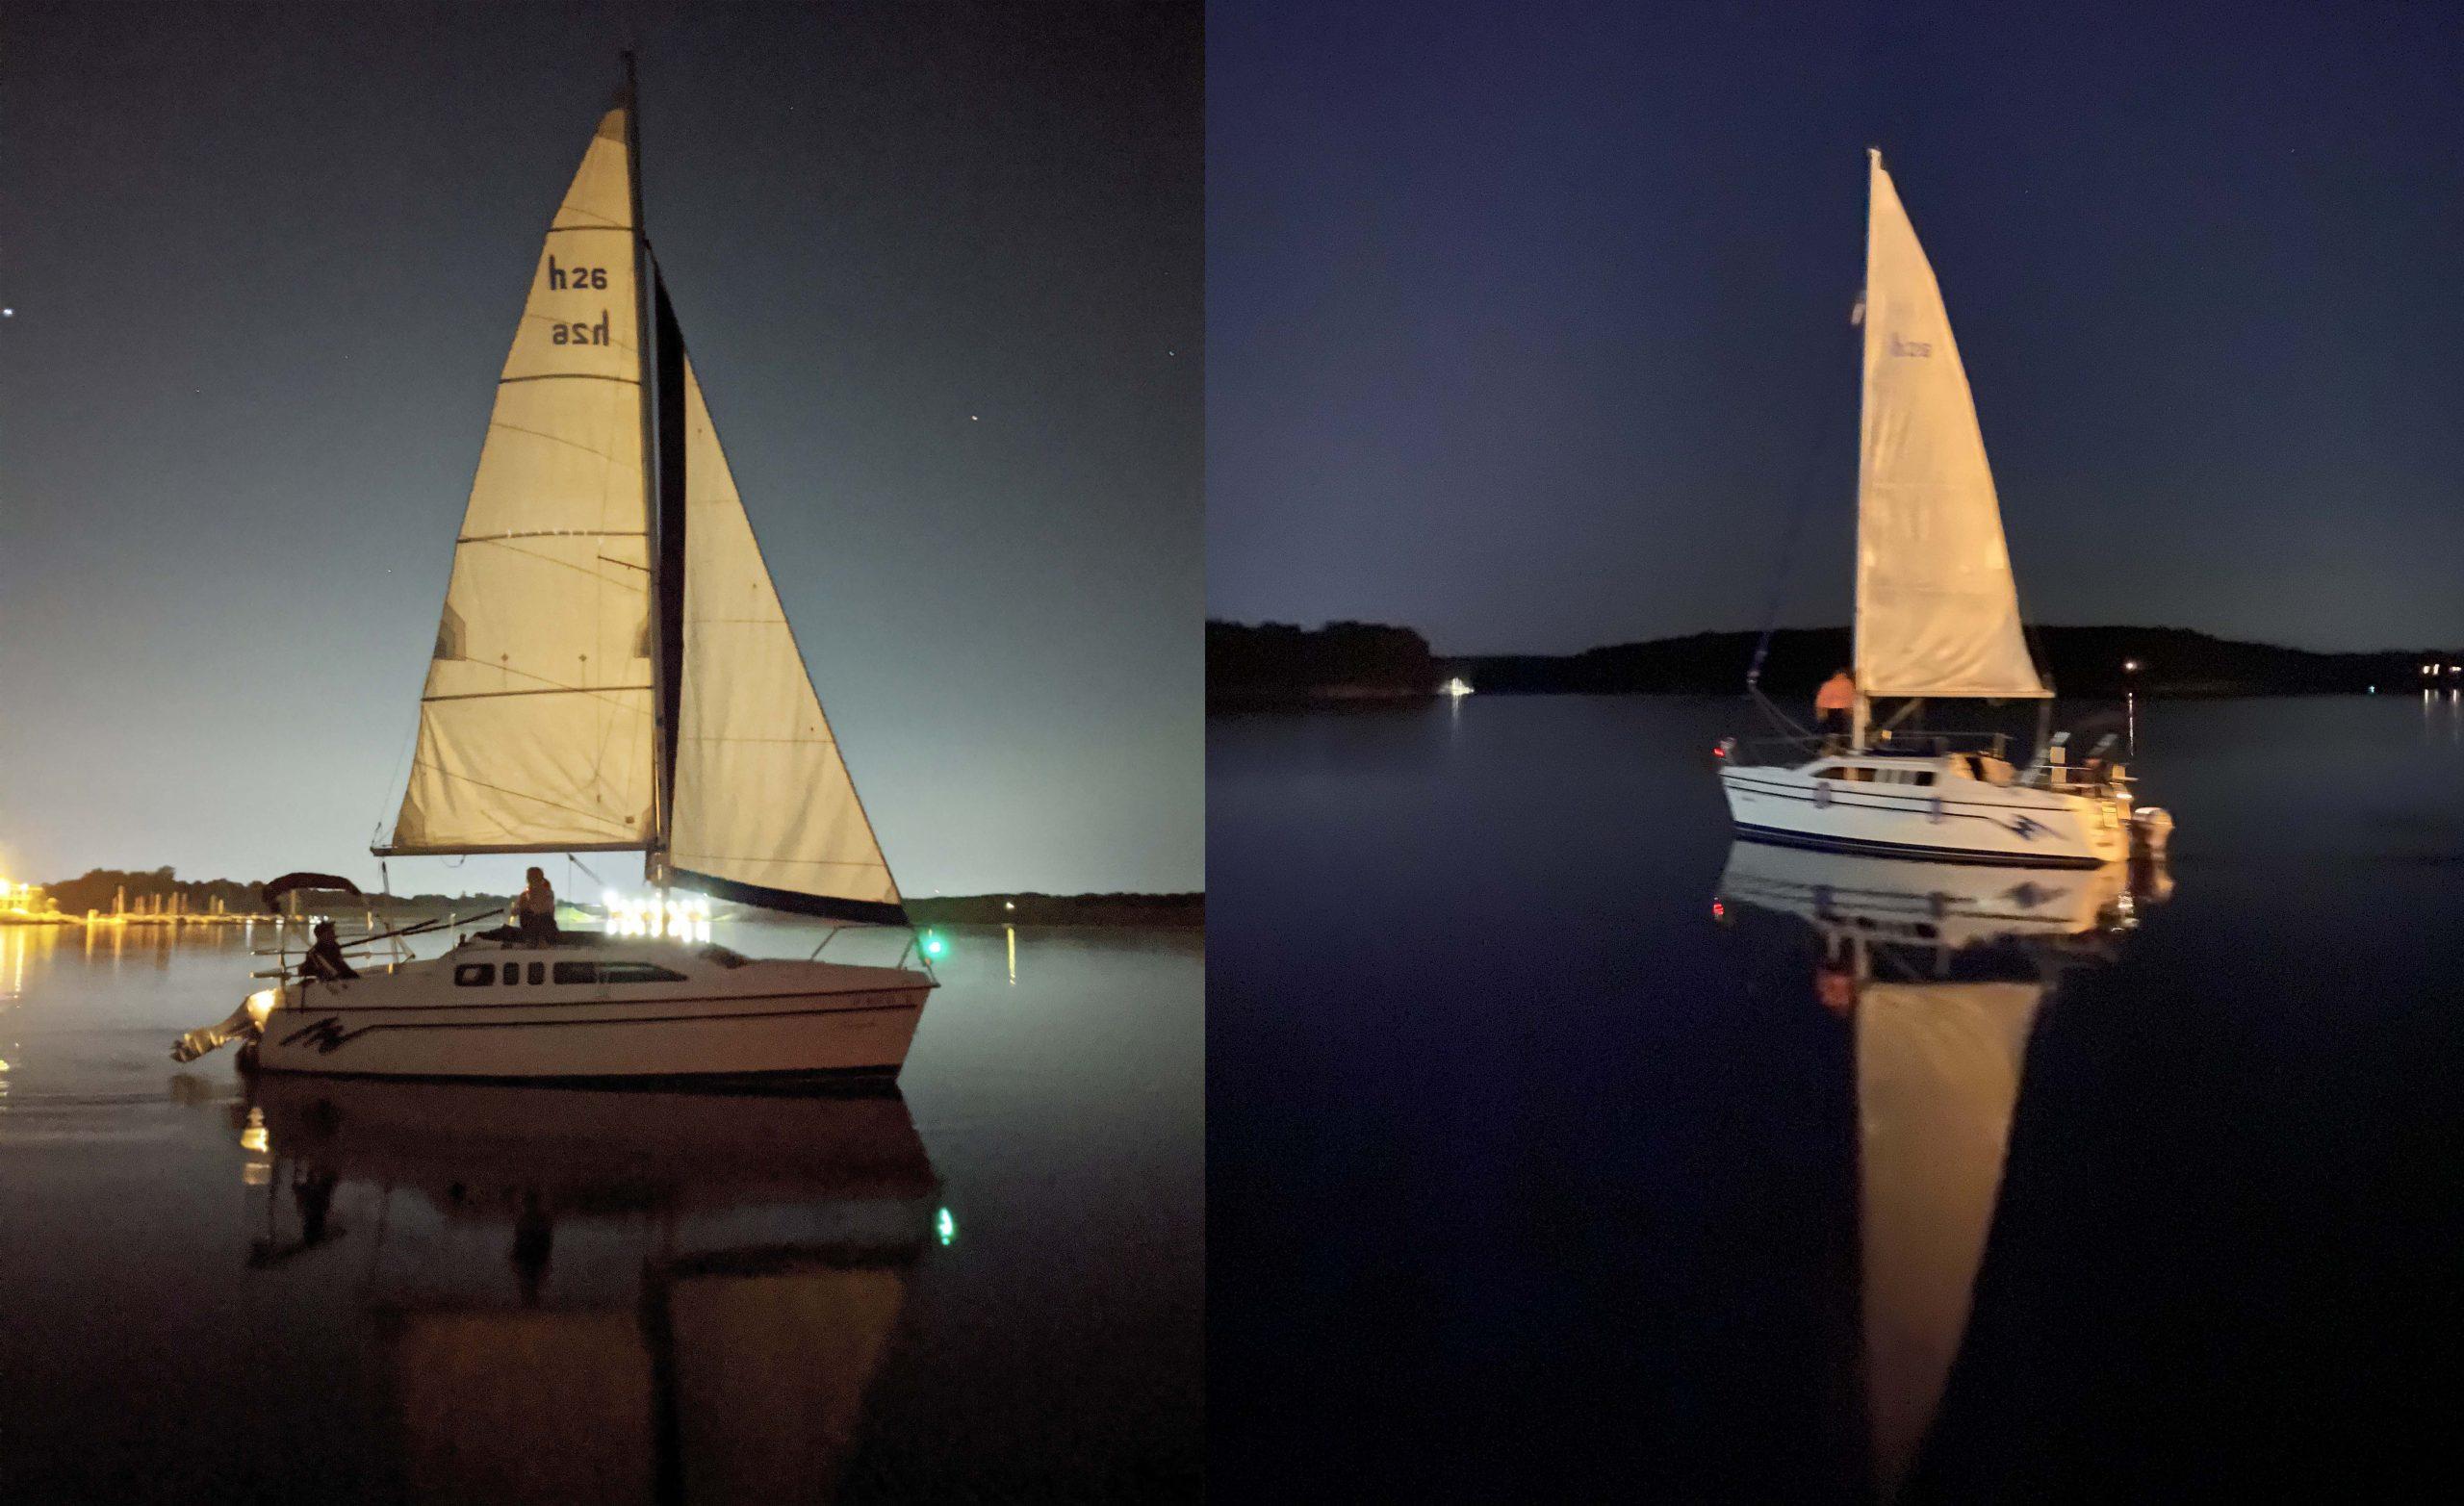 ECSC night sail